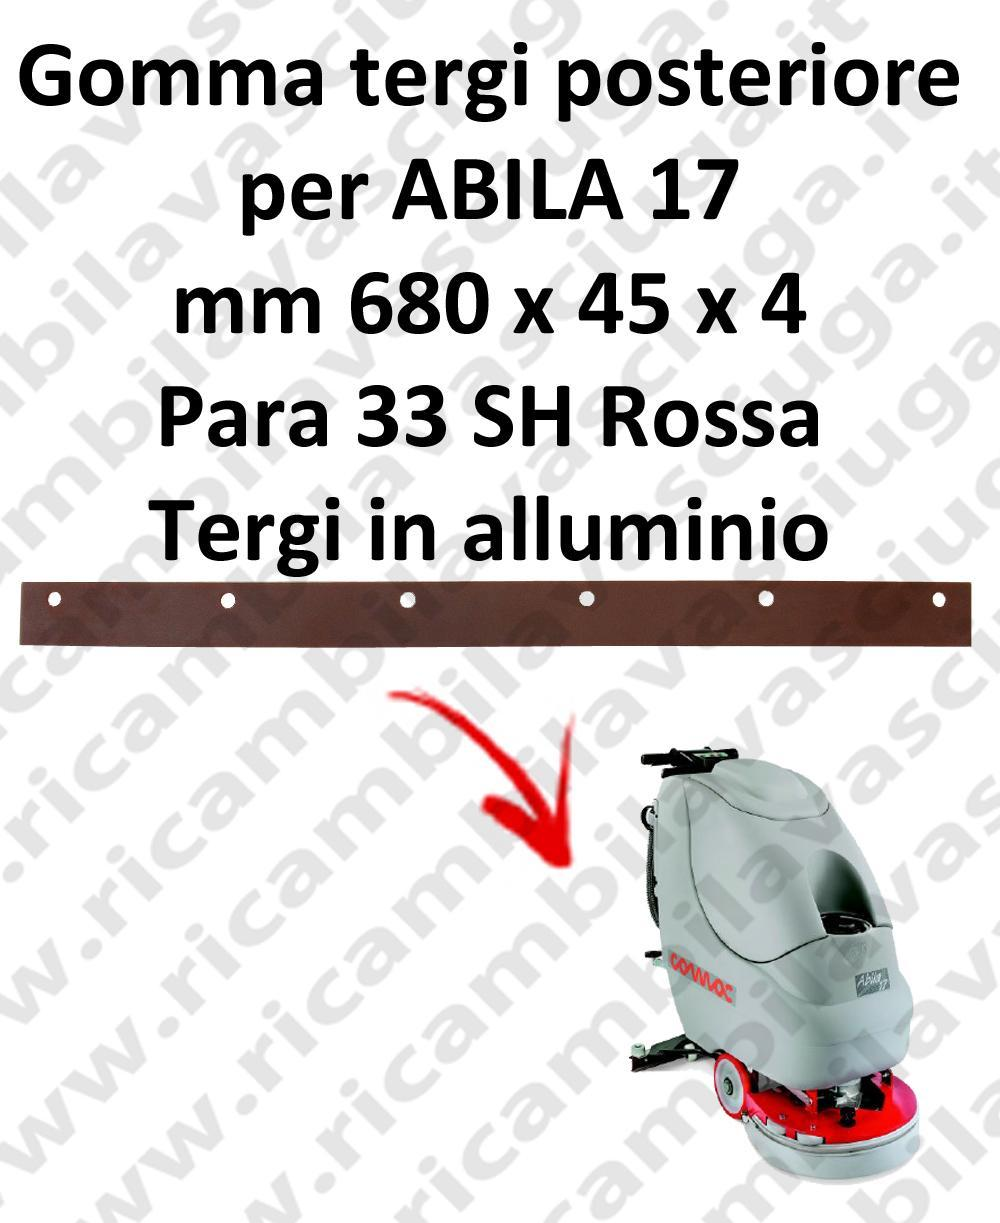 ABILA 17 Hinten sauglippen für scheuersaugmaschinen COMAC